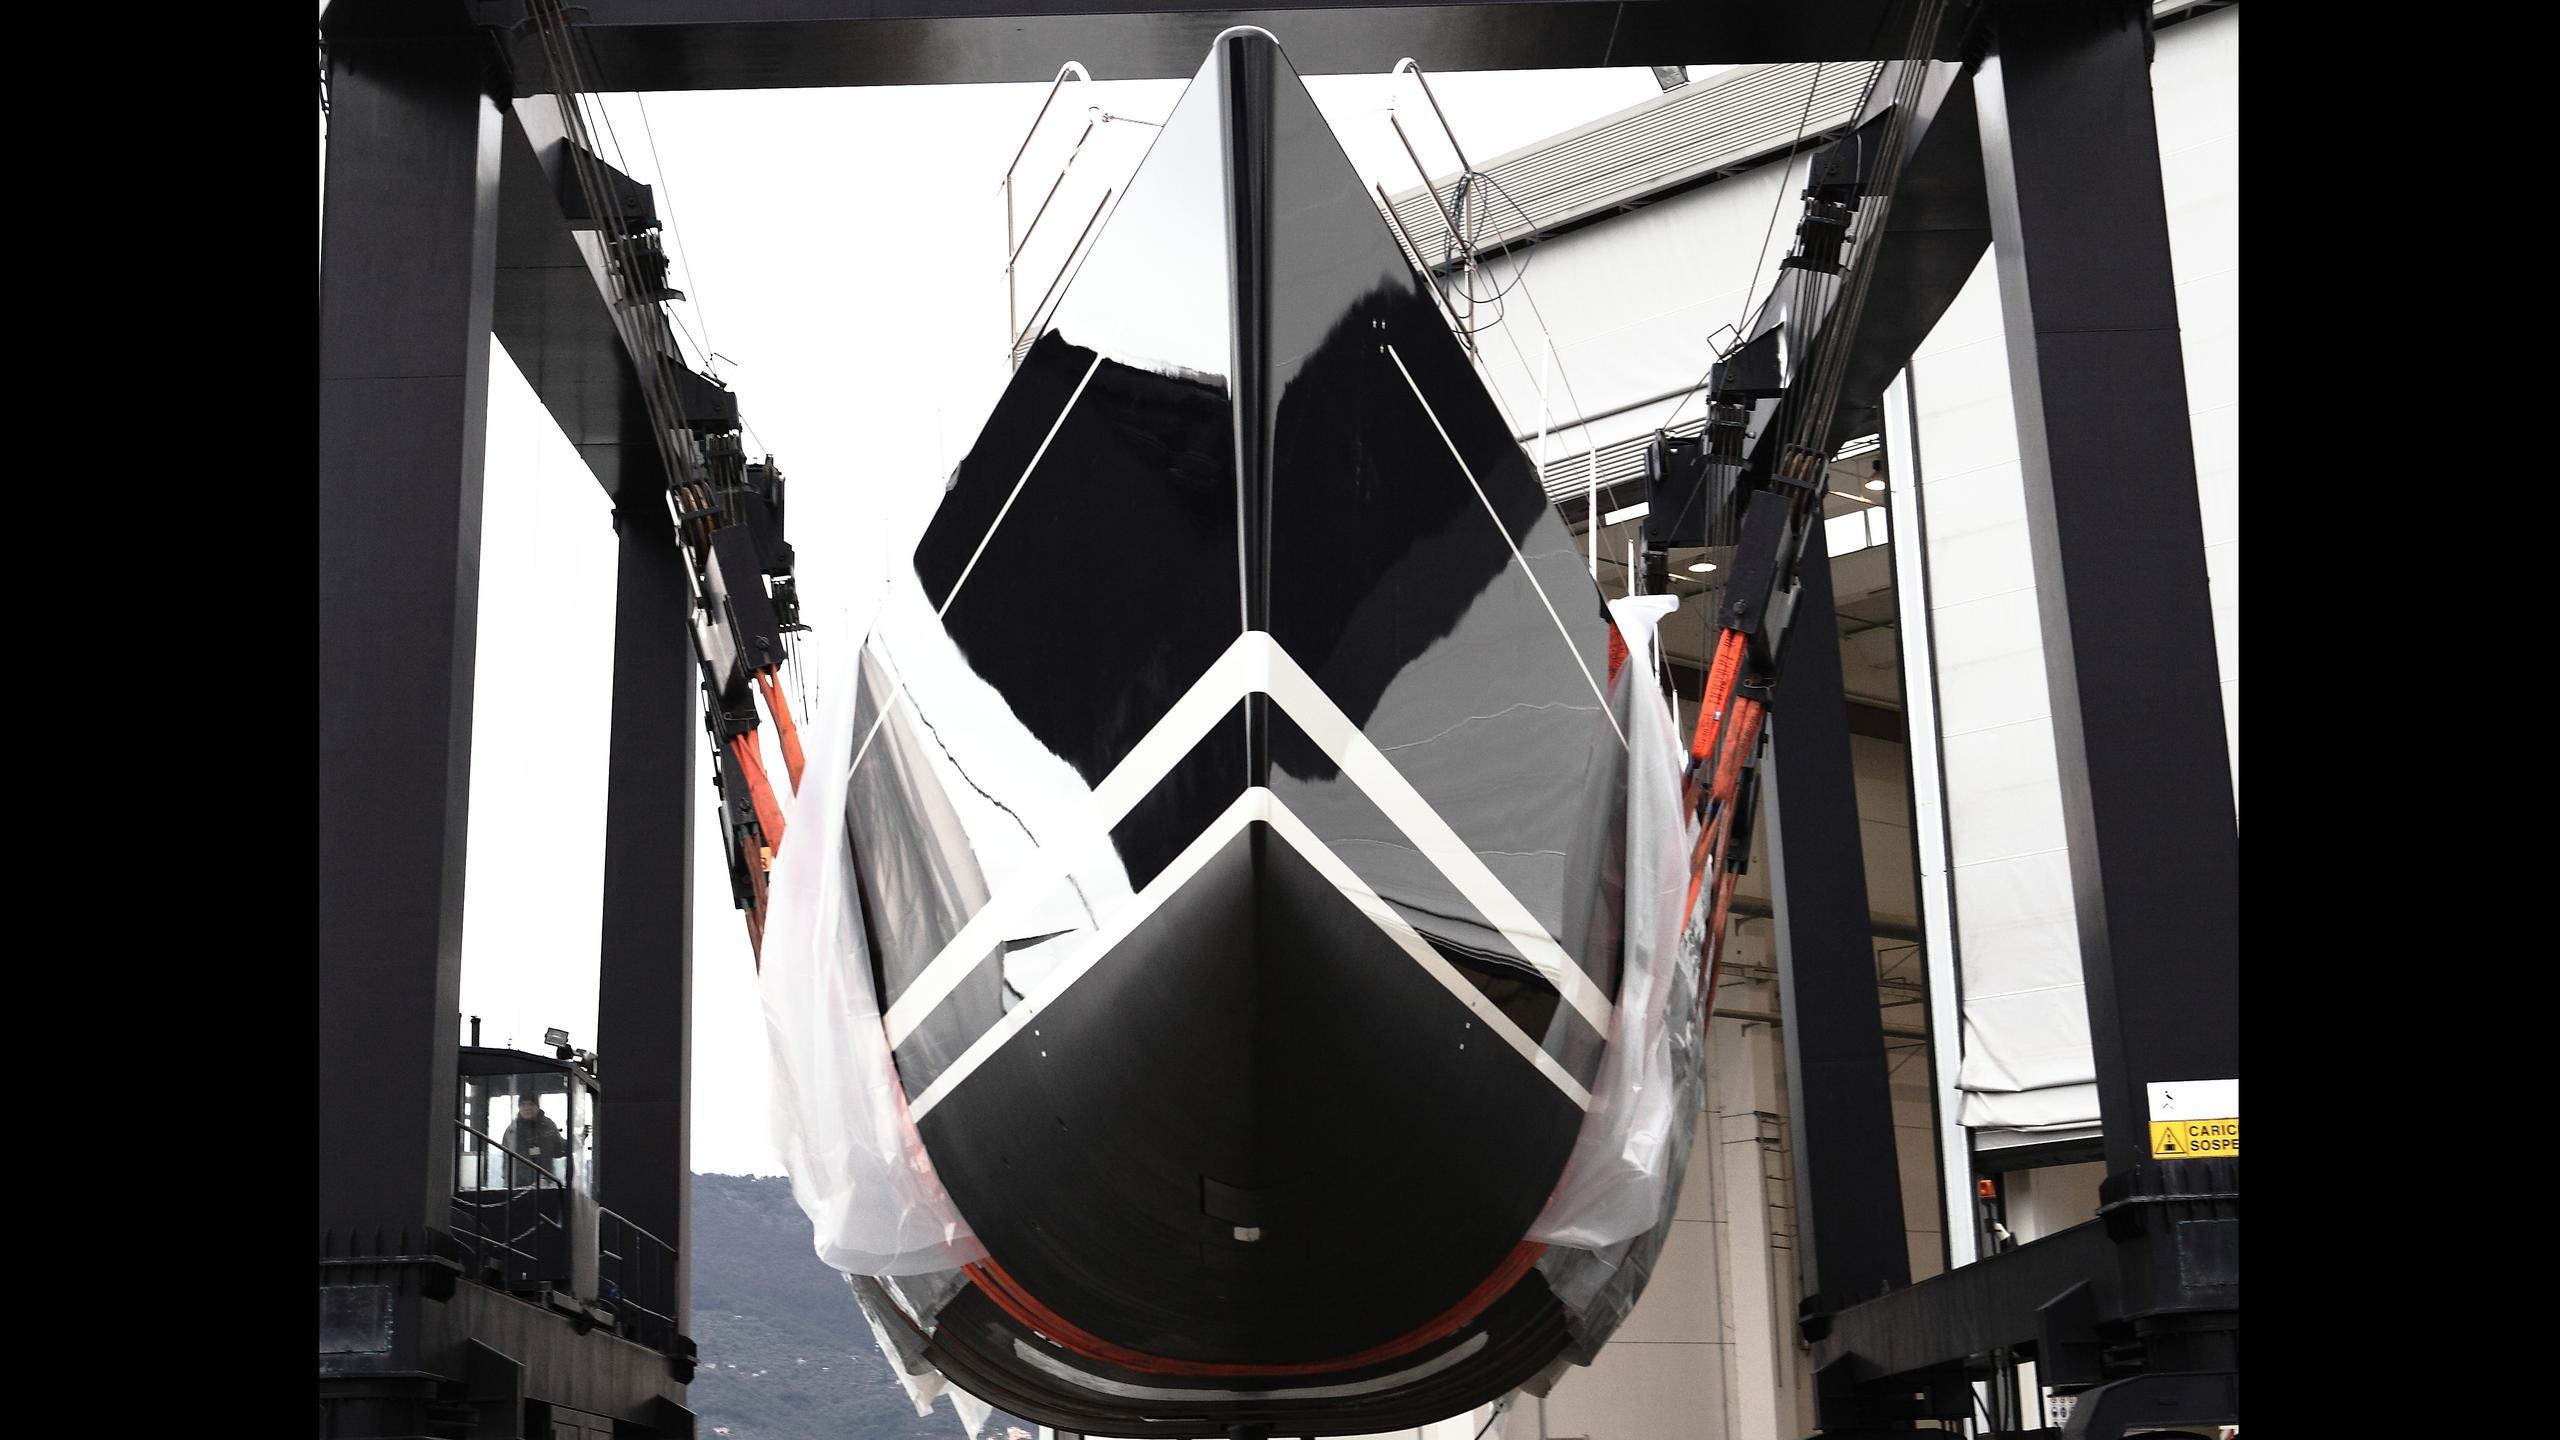 dahlak-sailing-yacht-perini-navi-2016-38m-bow-view